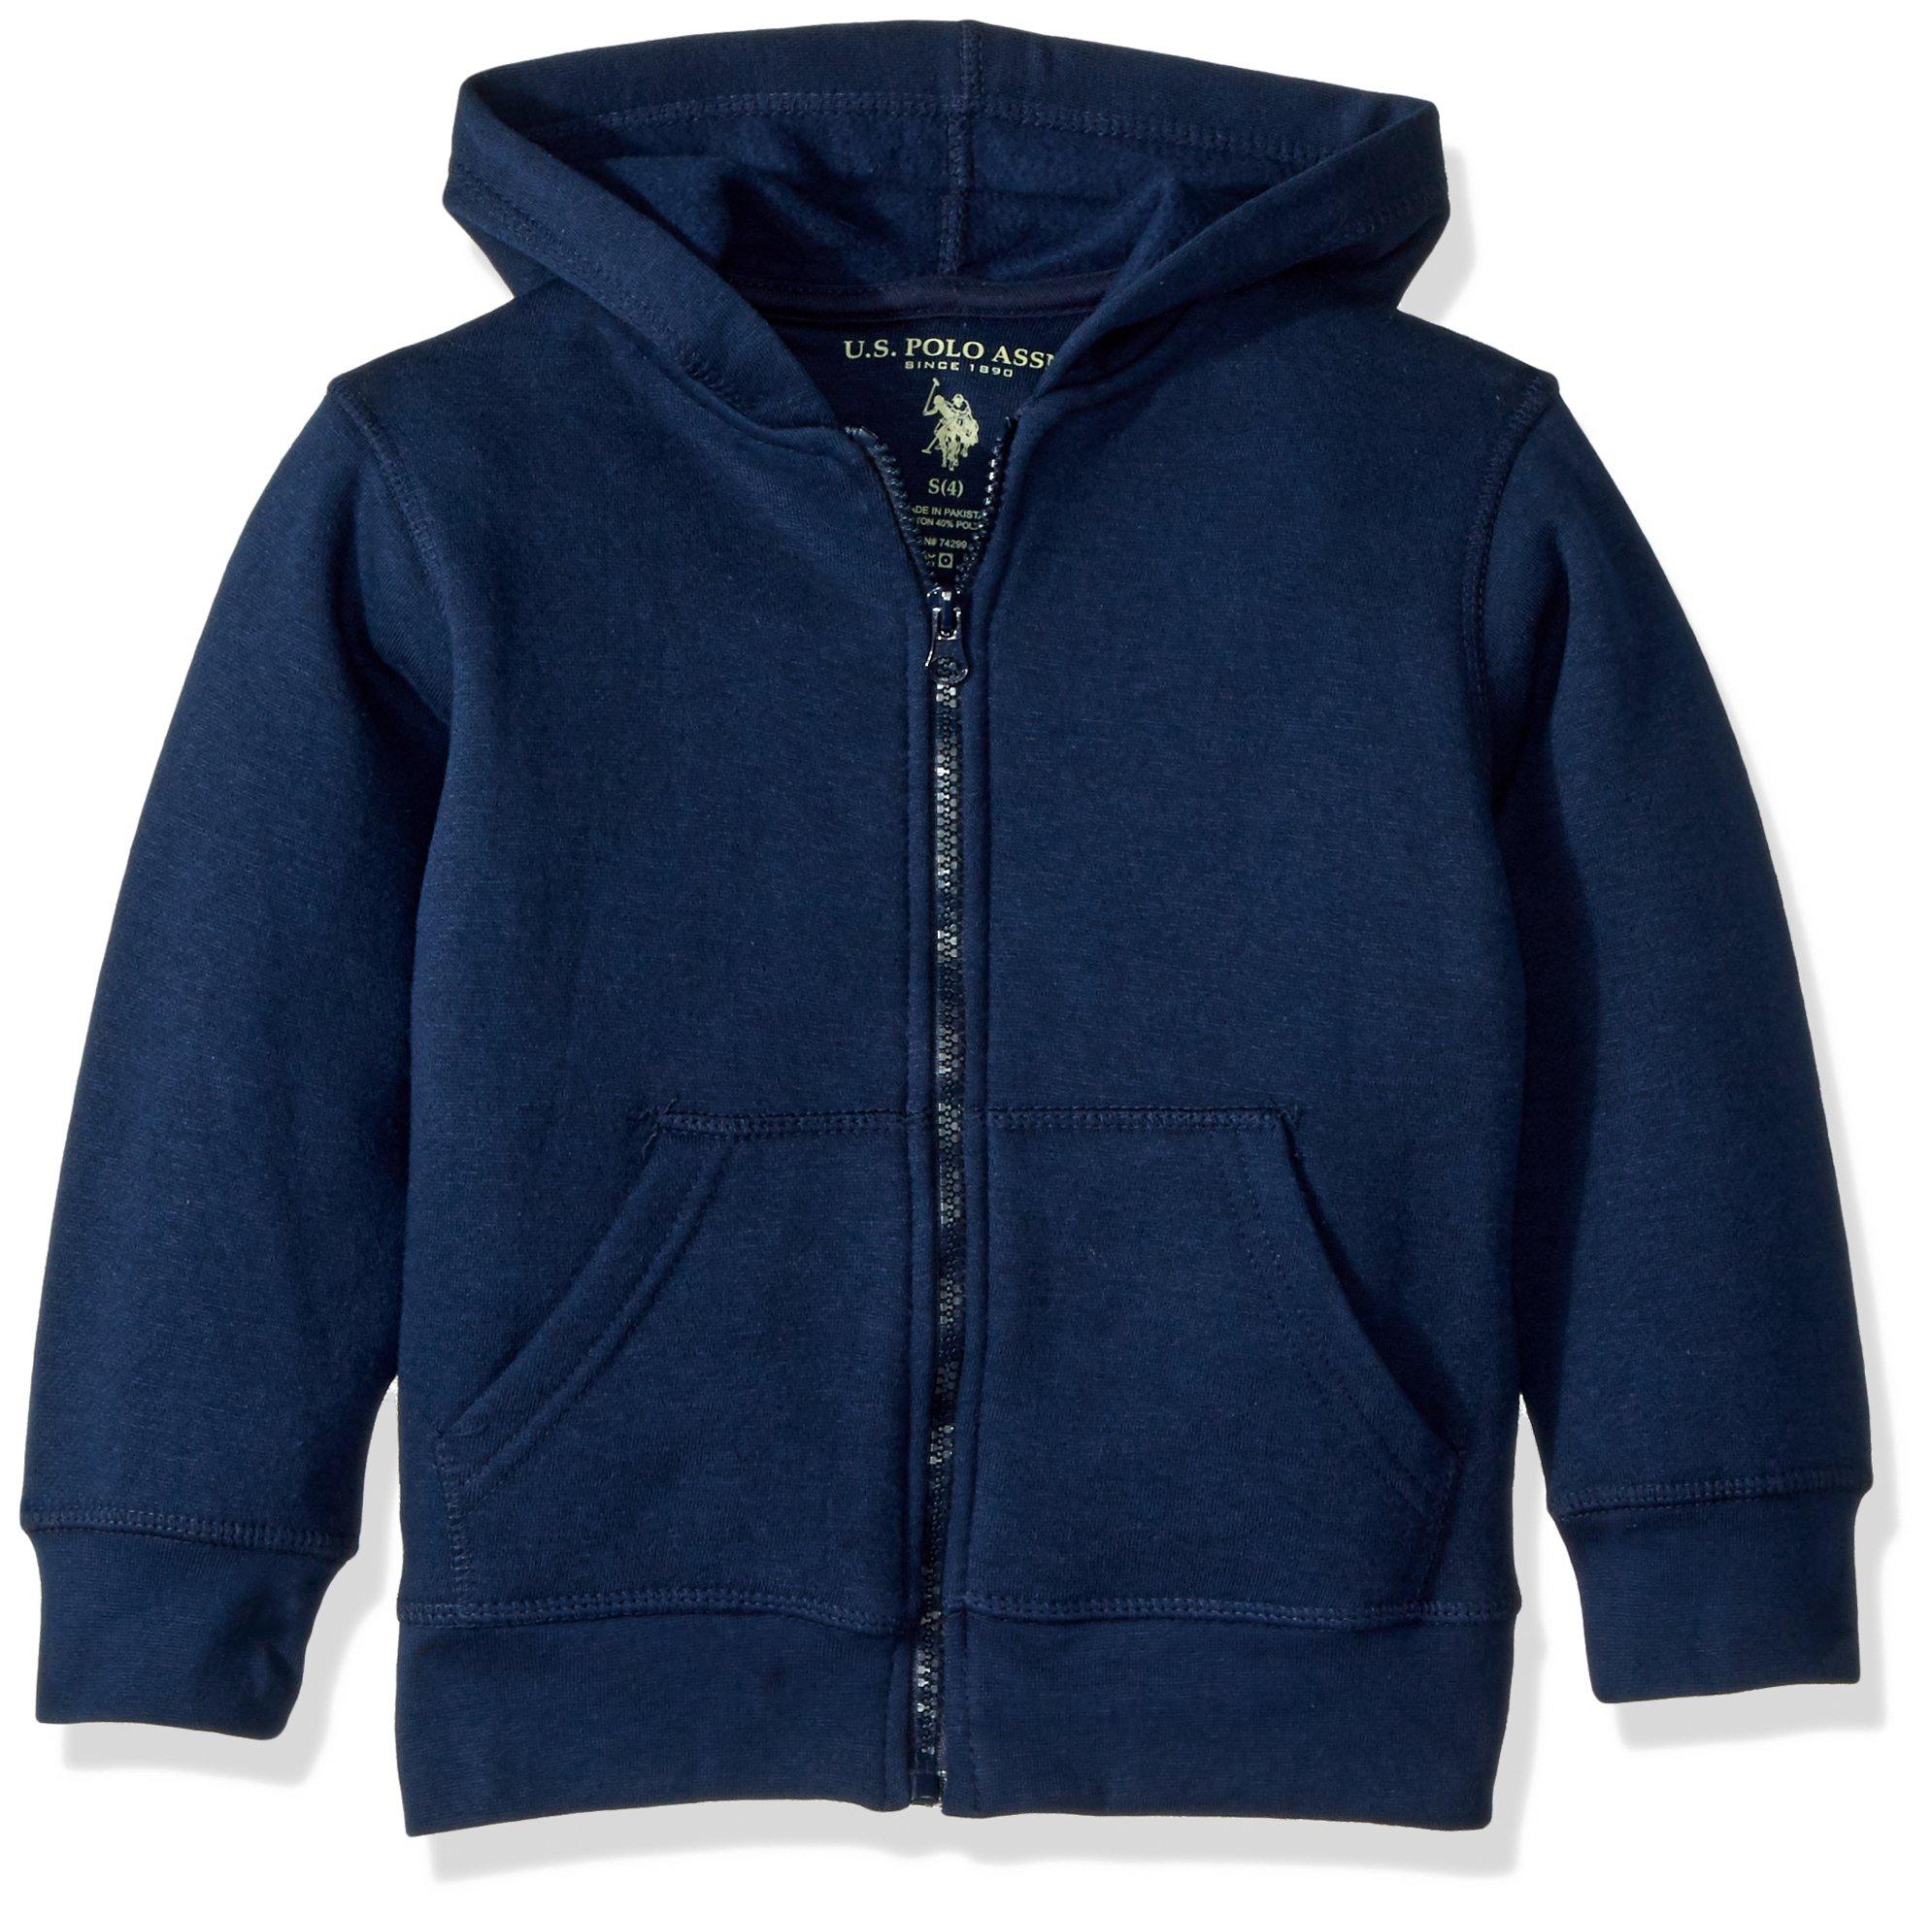 U.S. Polo Assn. Big Boys' Fleece Zip Front Hoody, Navy, 8